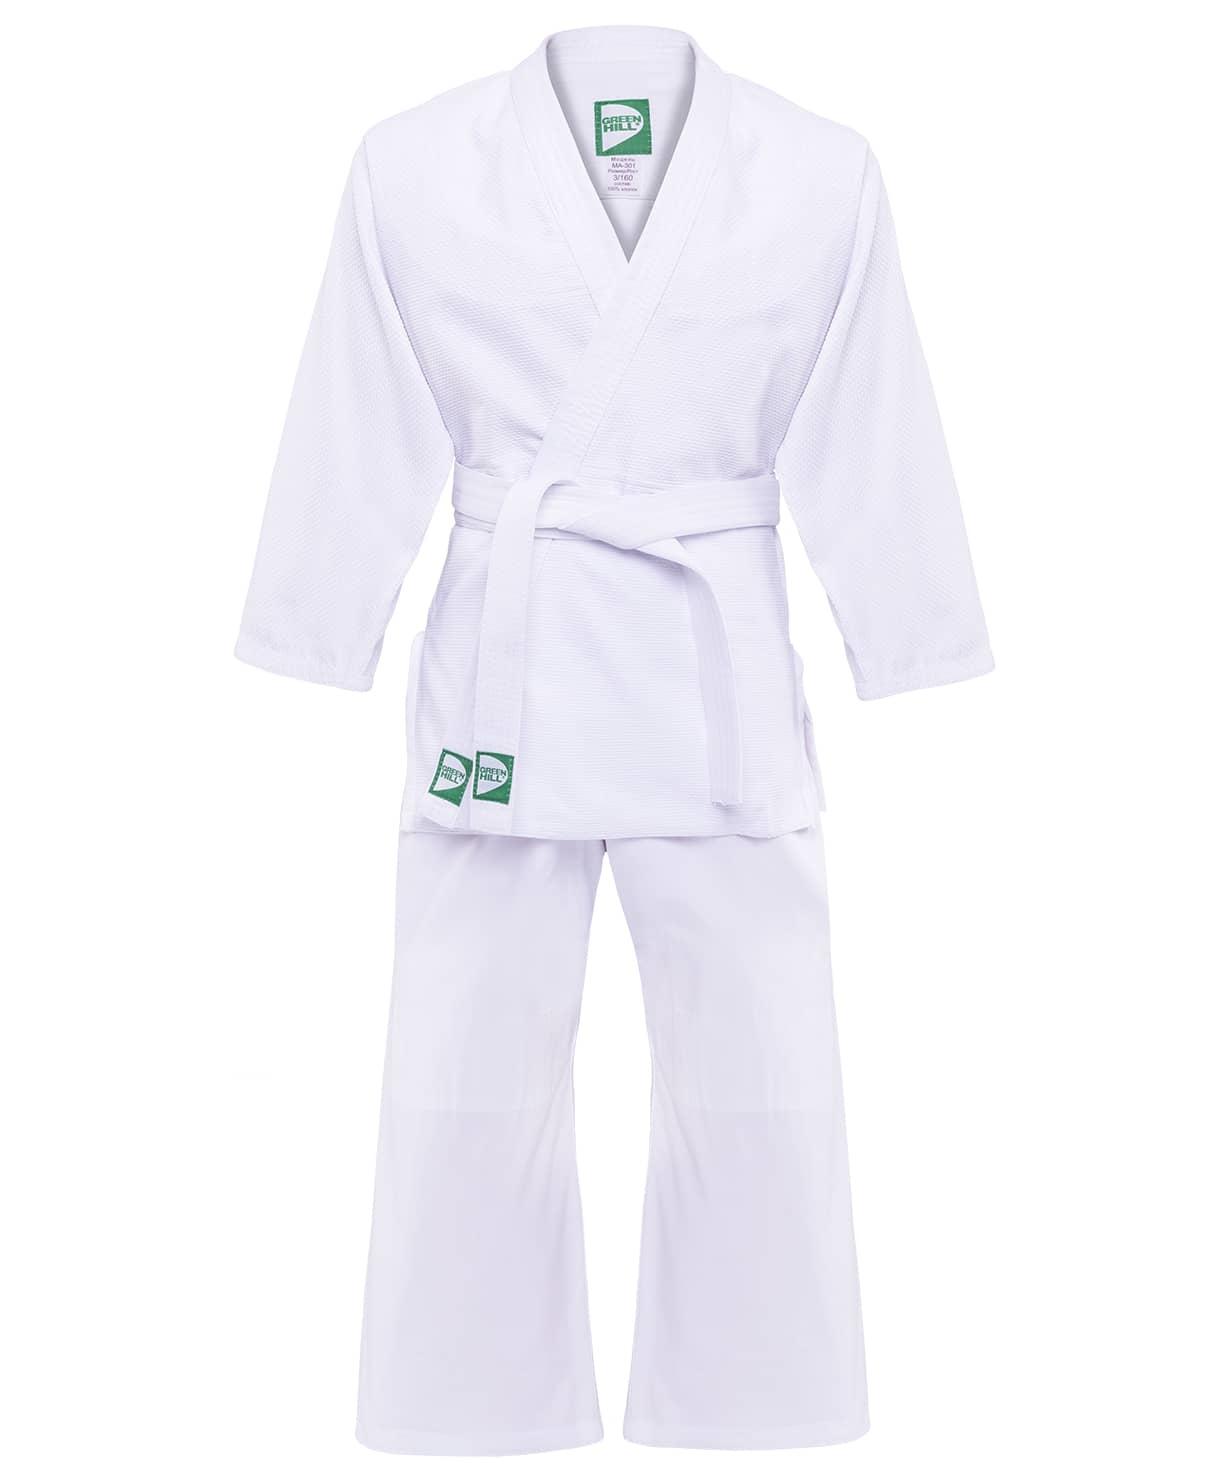 Кимоно для дзюдо MA-301 белый, р.0/130